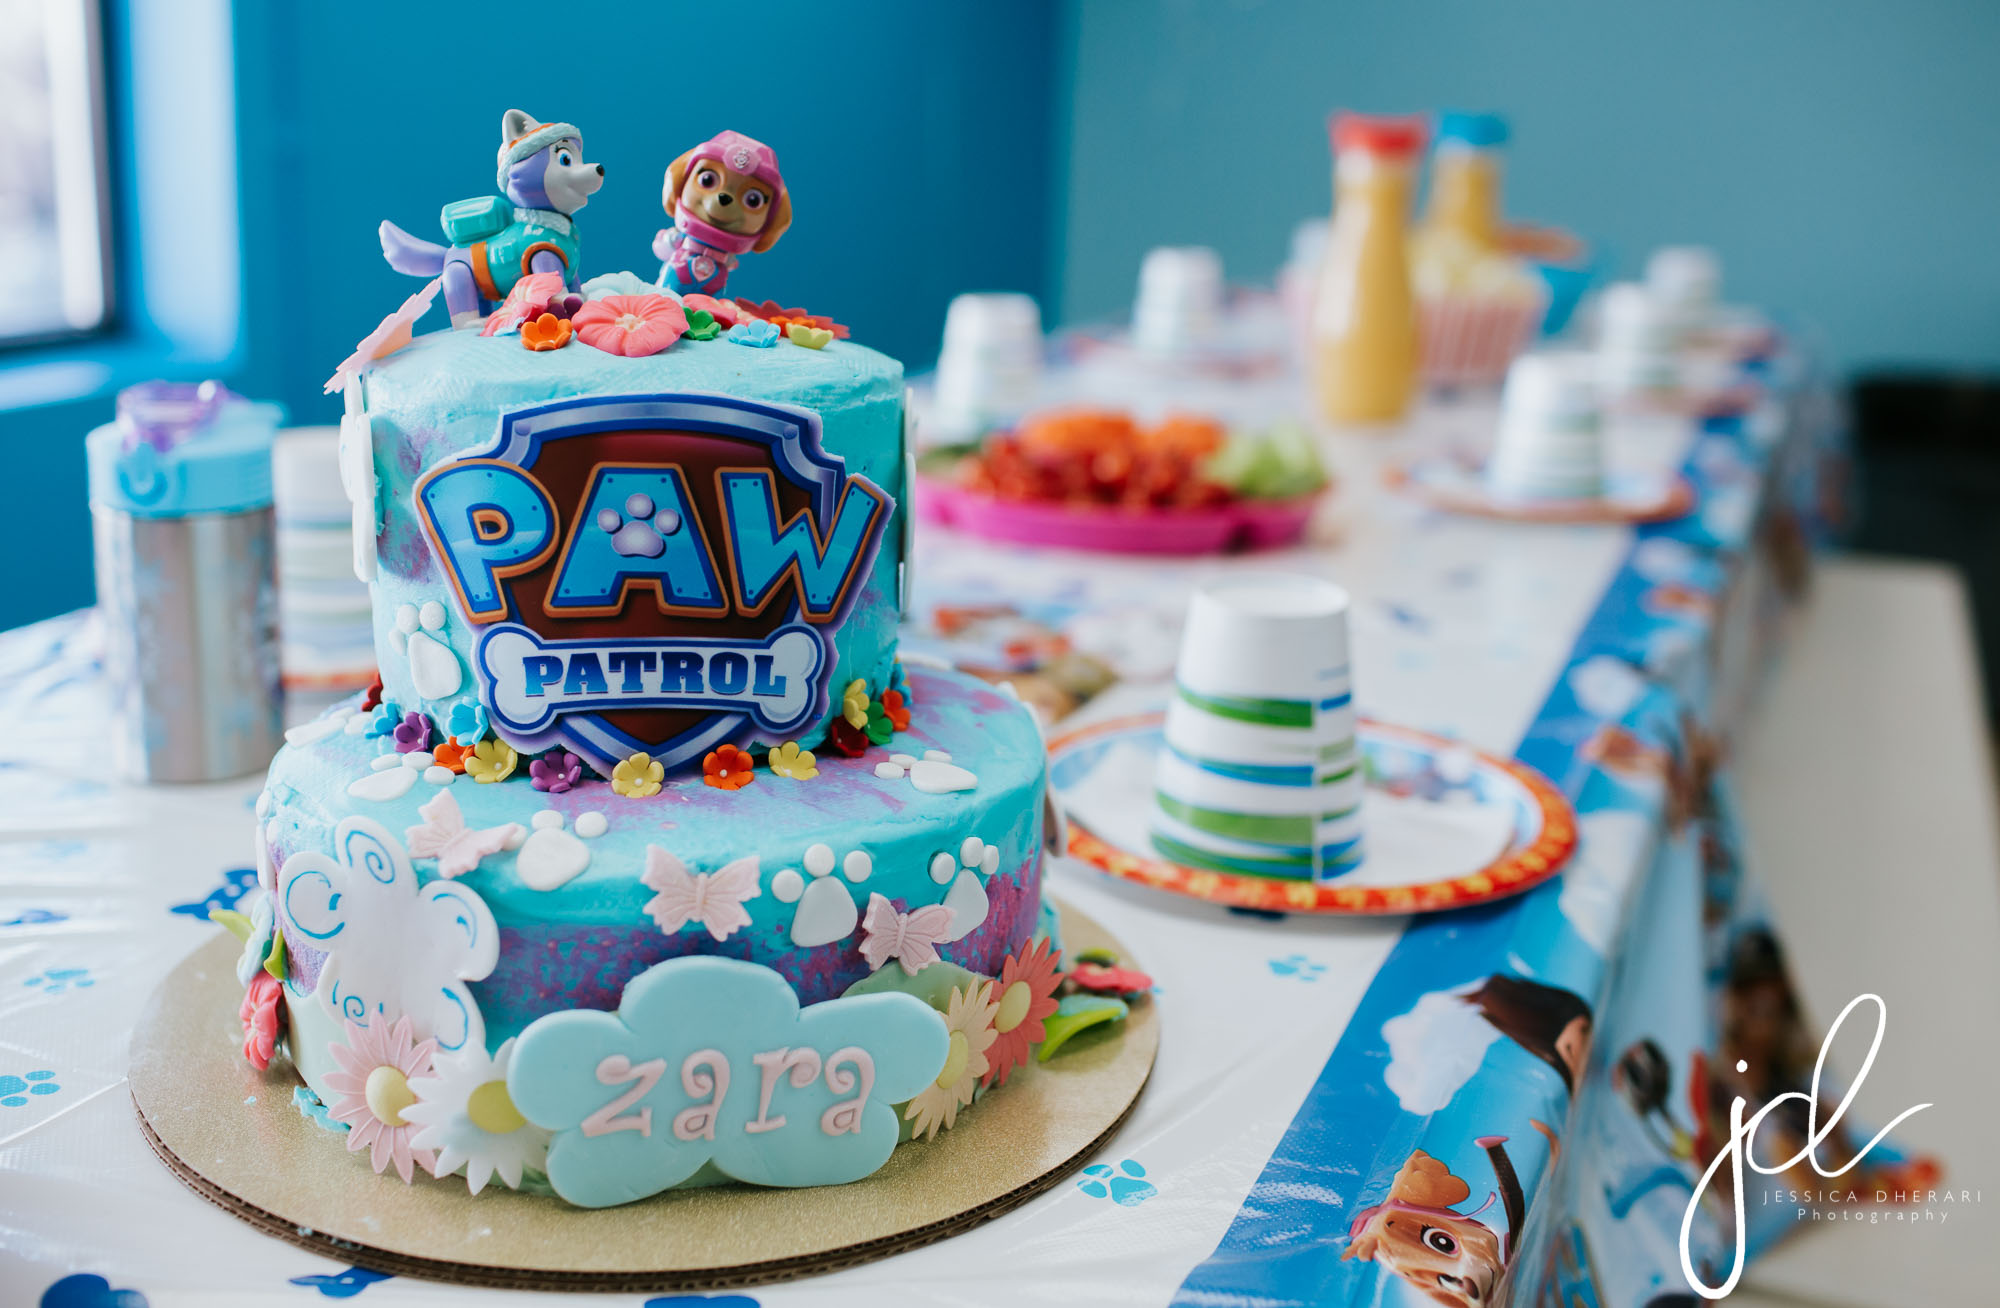 Zaras 4th Birthday Richmond Bc Birthday Party Photographer